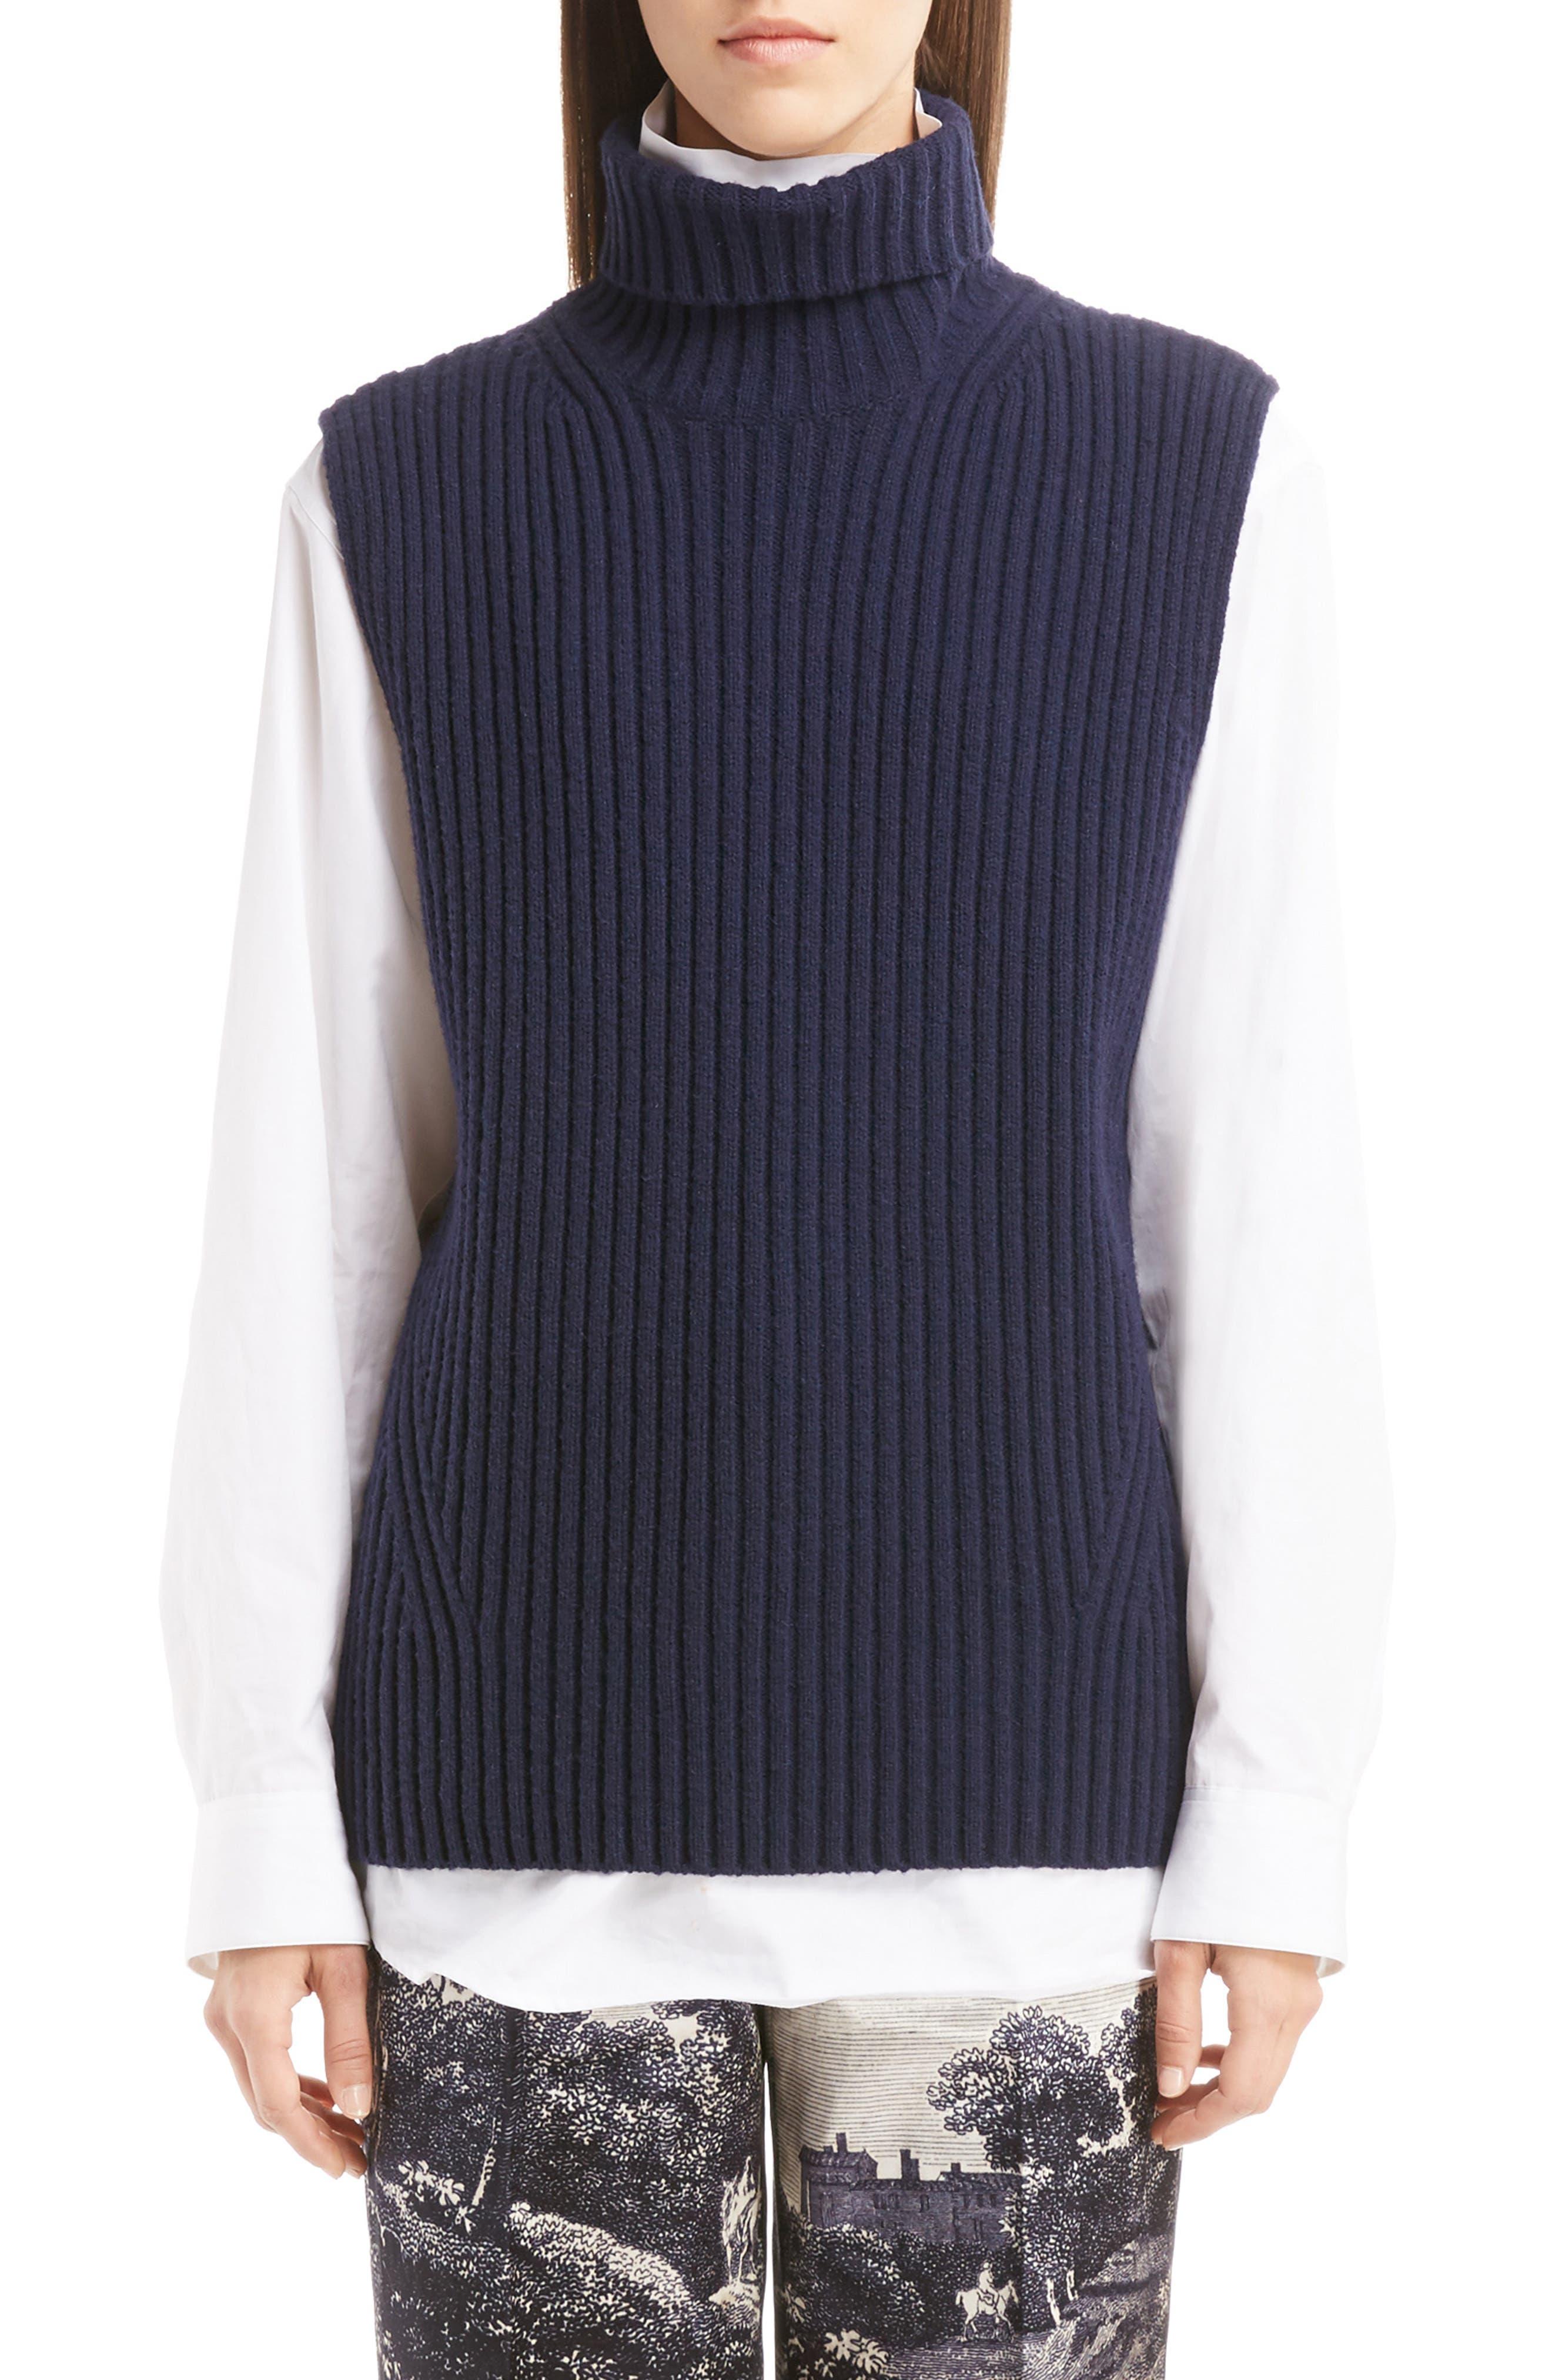 Dries Van Noten Sleeveless Turtleneck Sweater